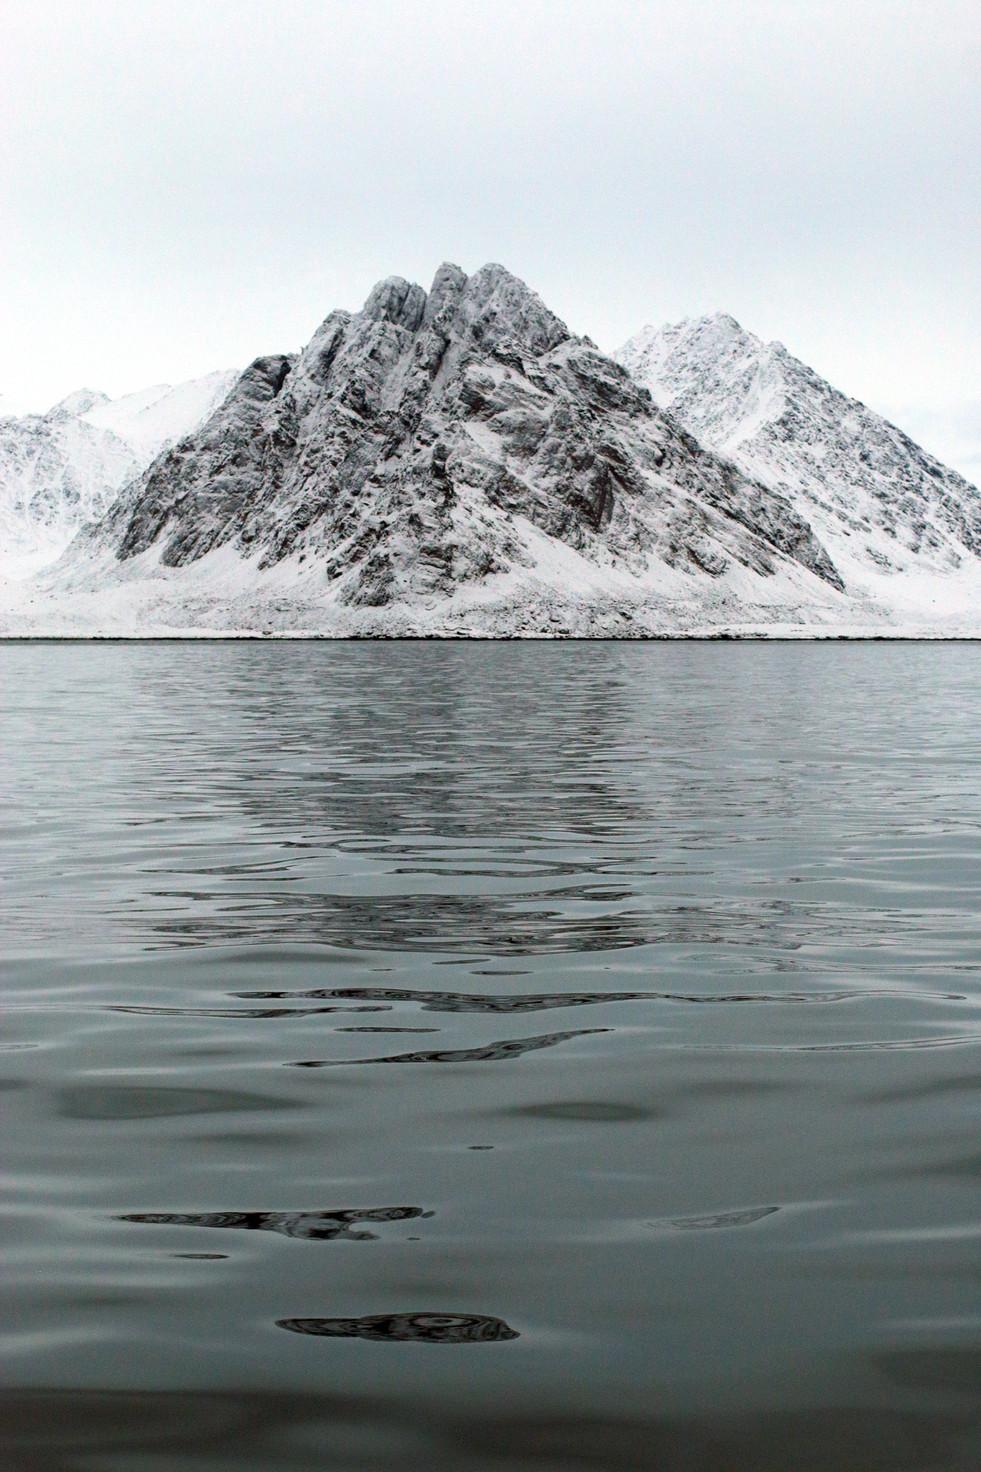 Arctic Mountain I